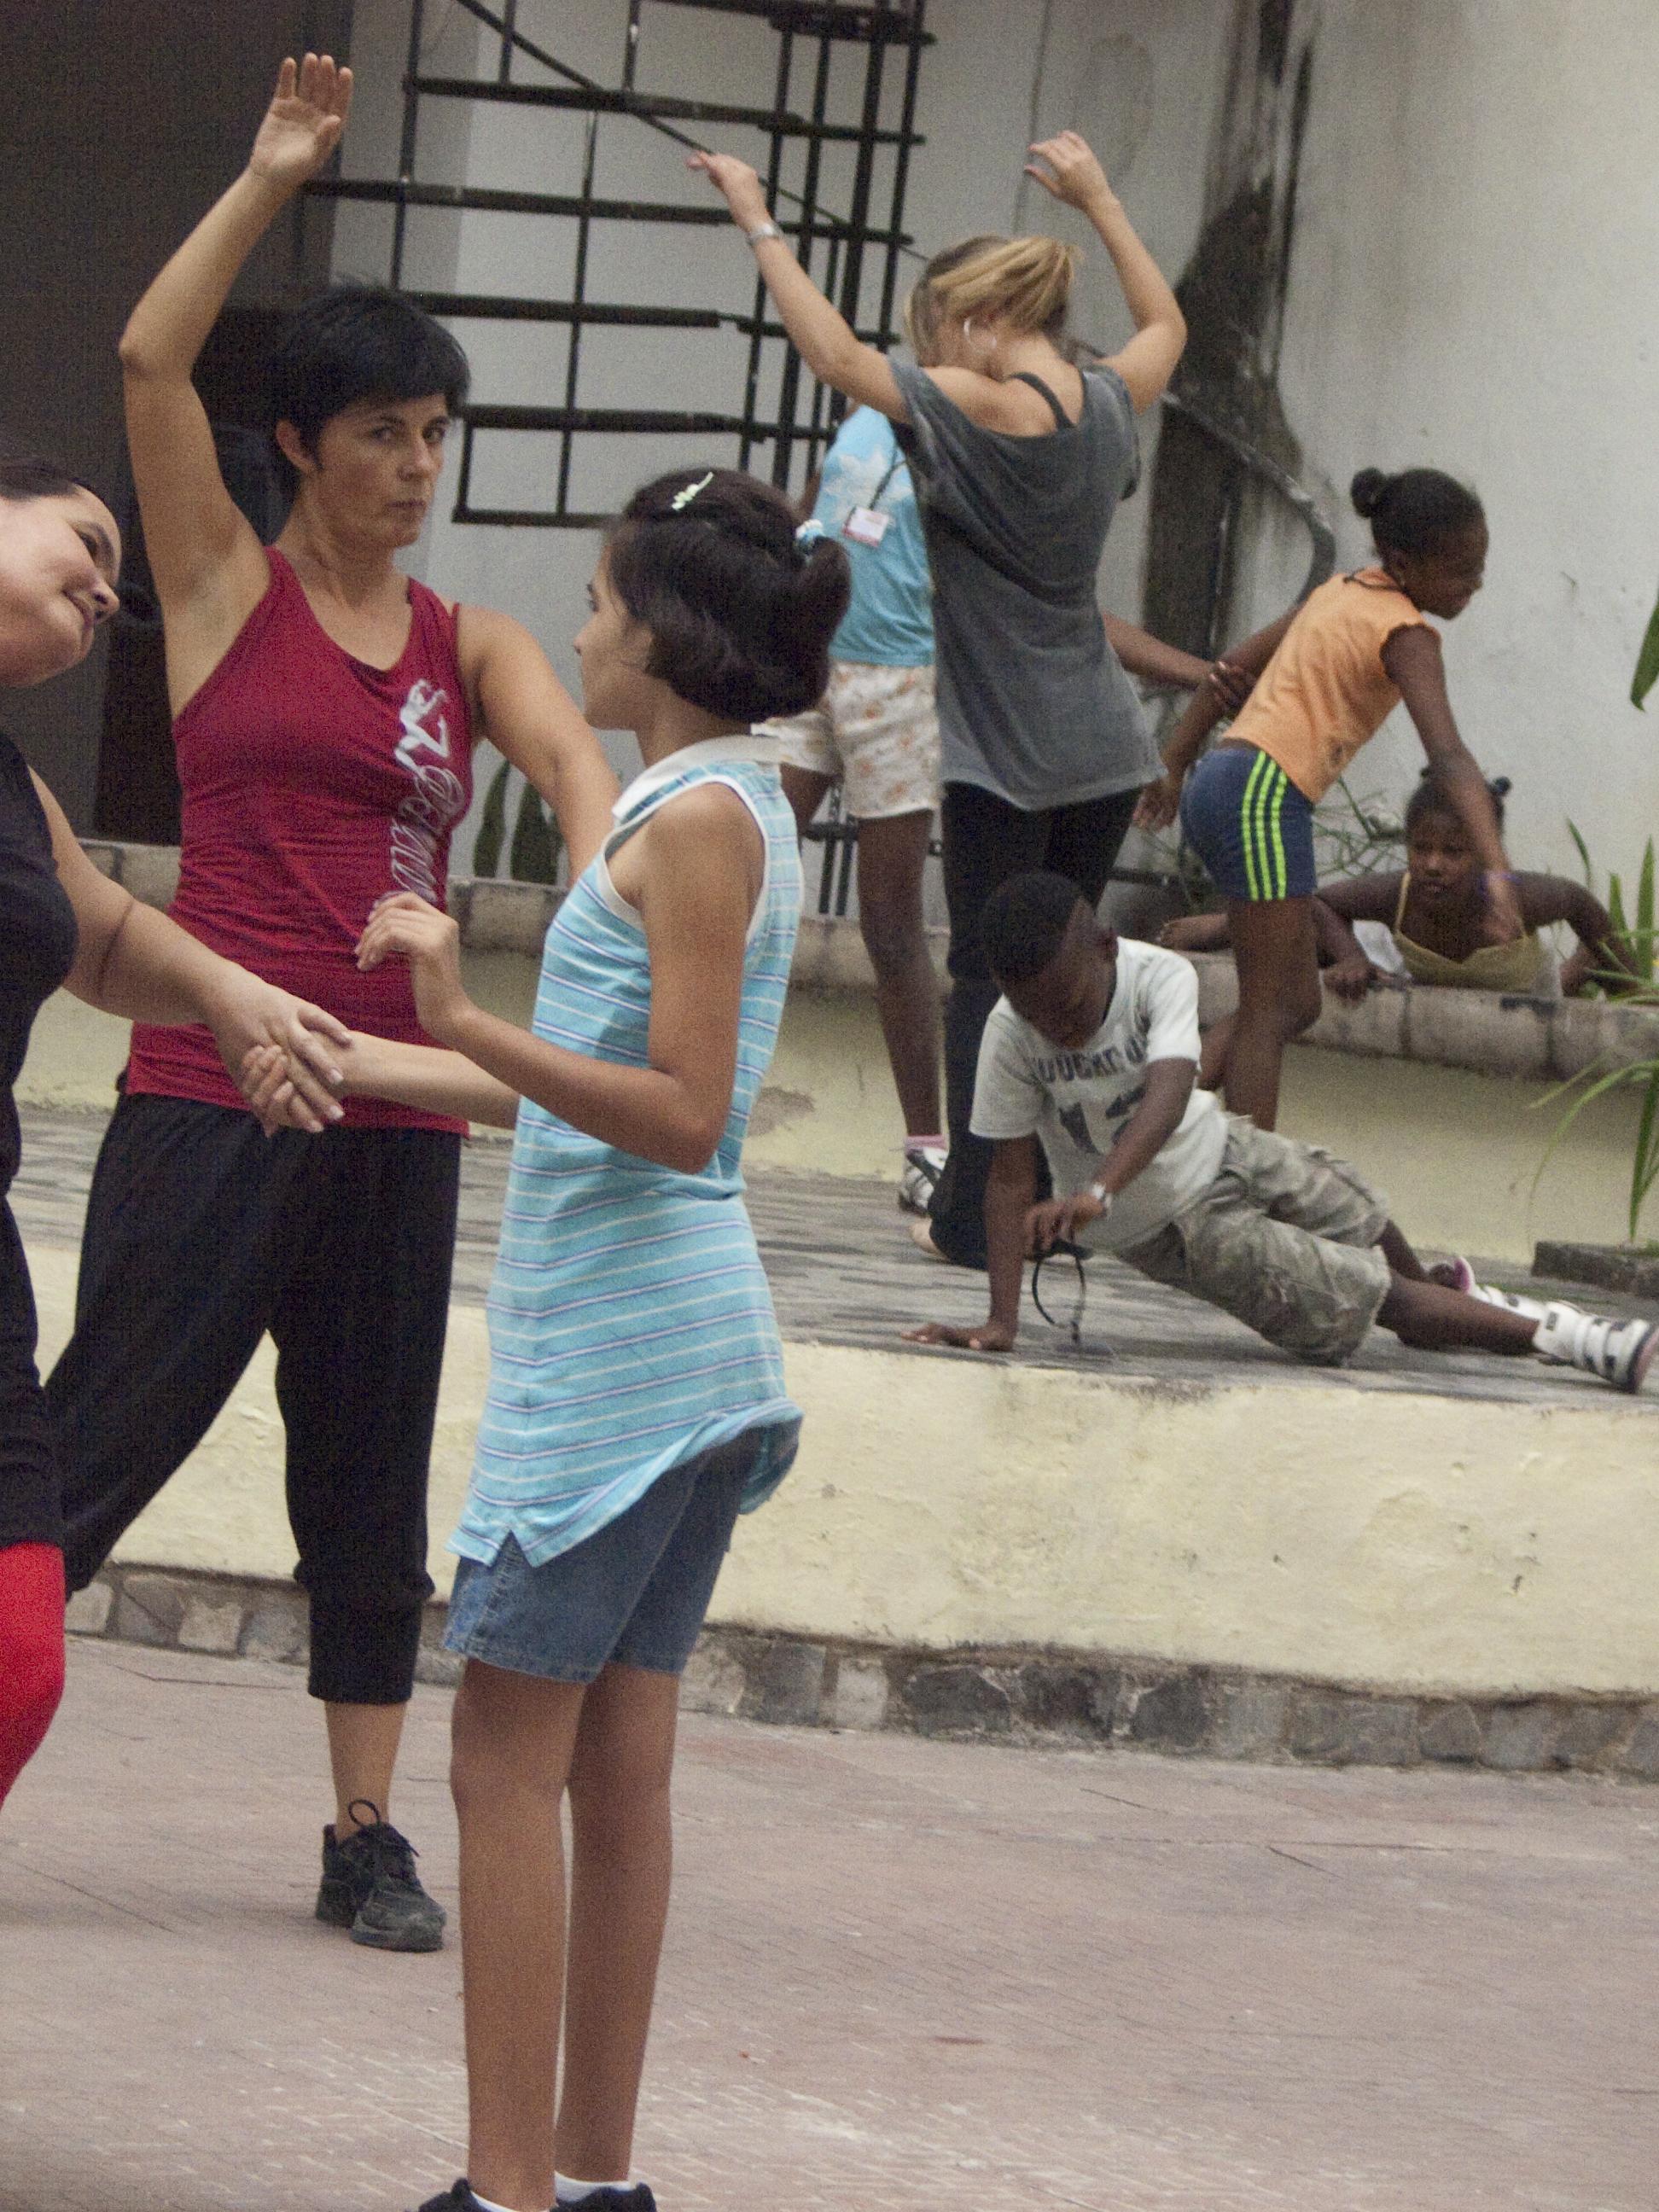 Festival de Paisajes Urbanos/La Habana Vieja/ Cuba 2012